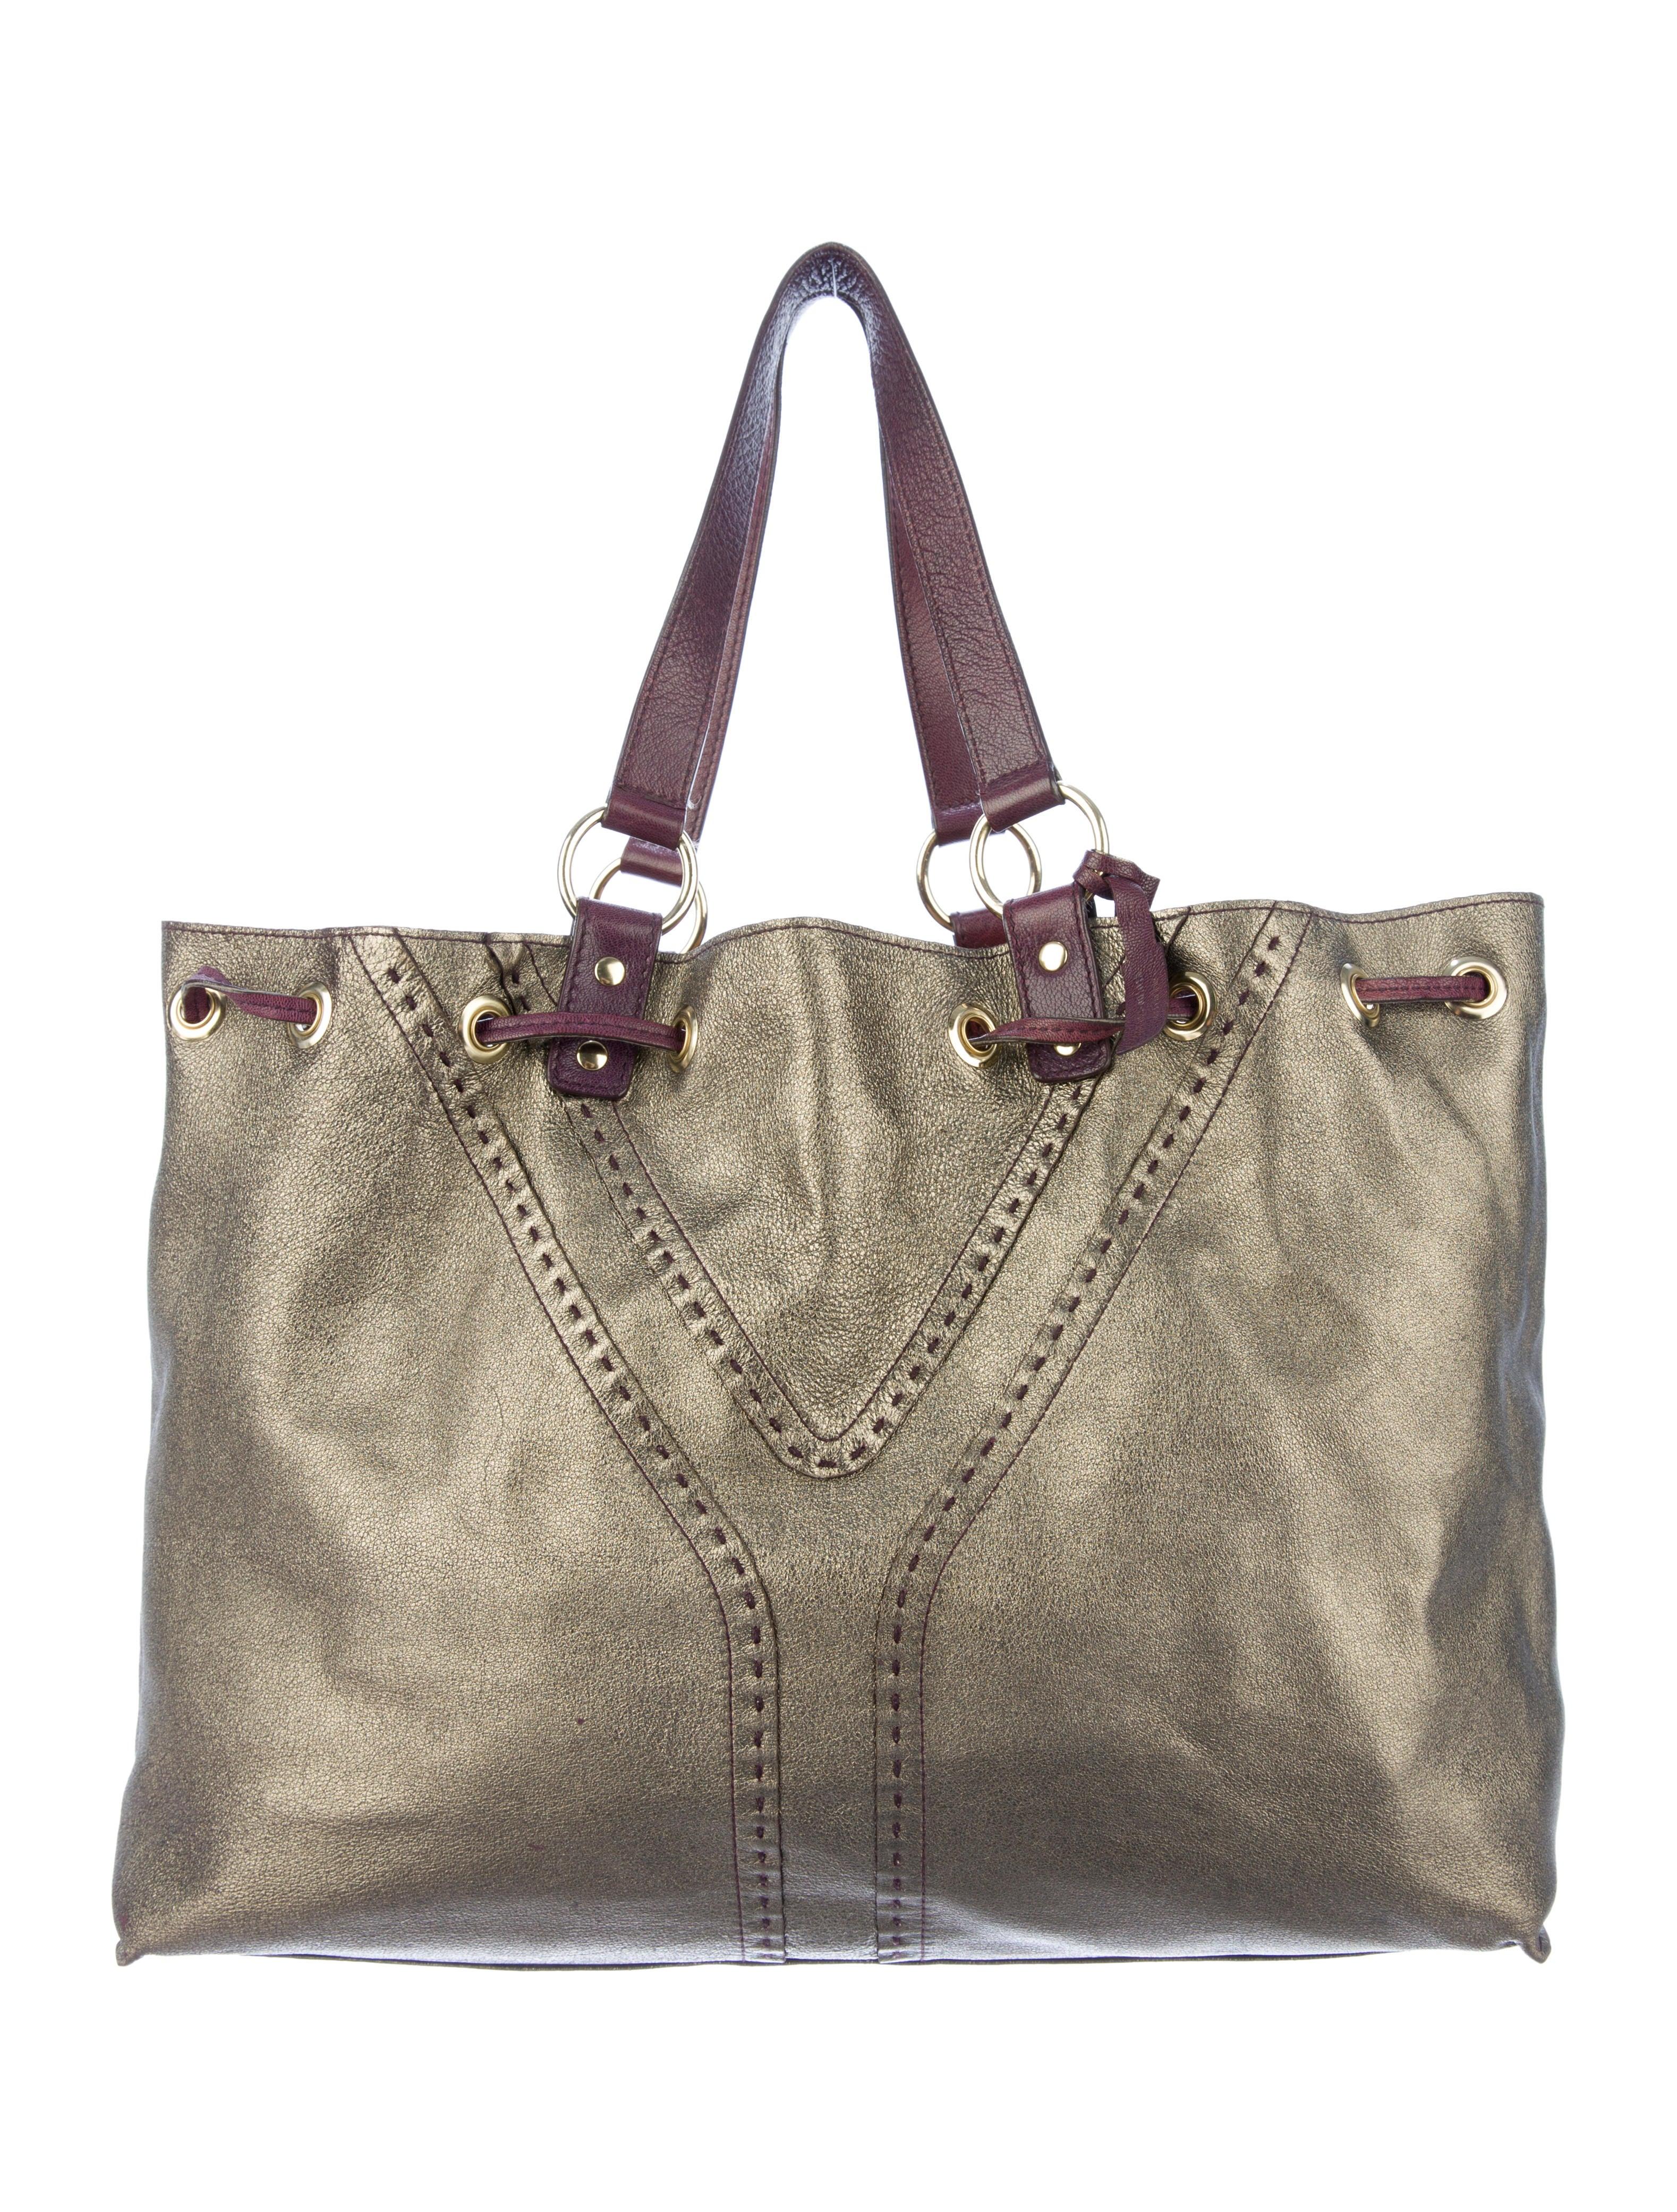 celine handbag mini - yves saint laurent double sac reversible tote, ysl replica handbag